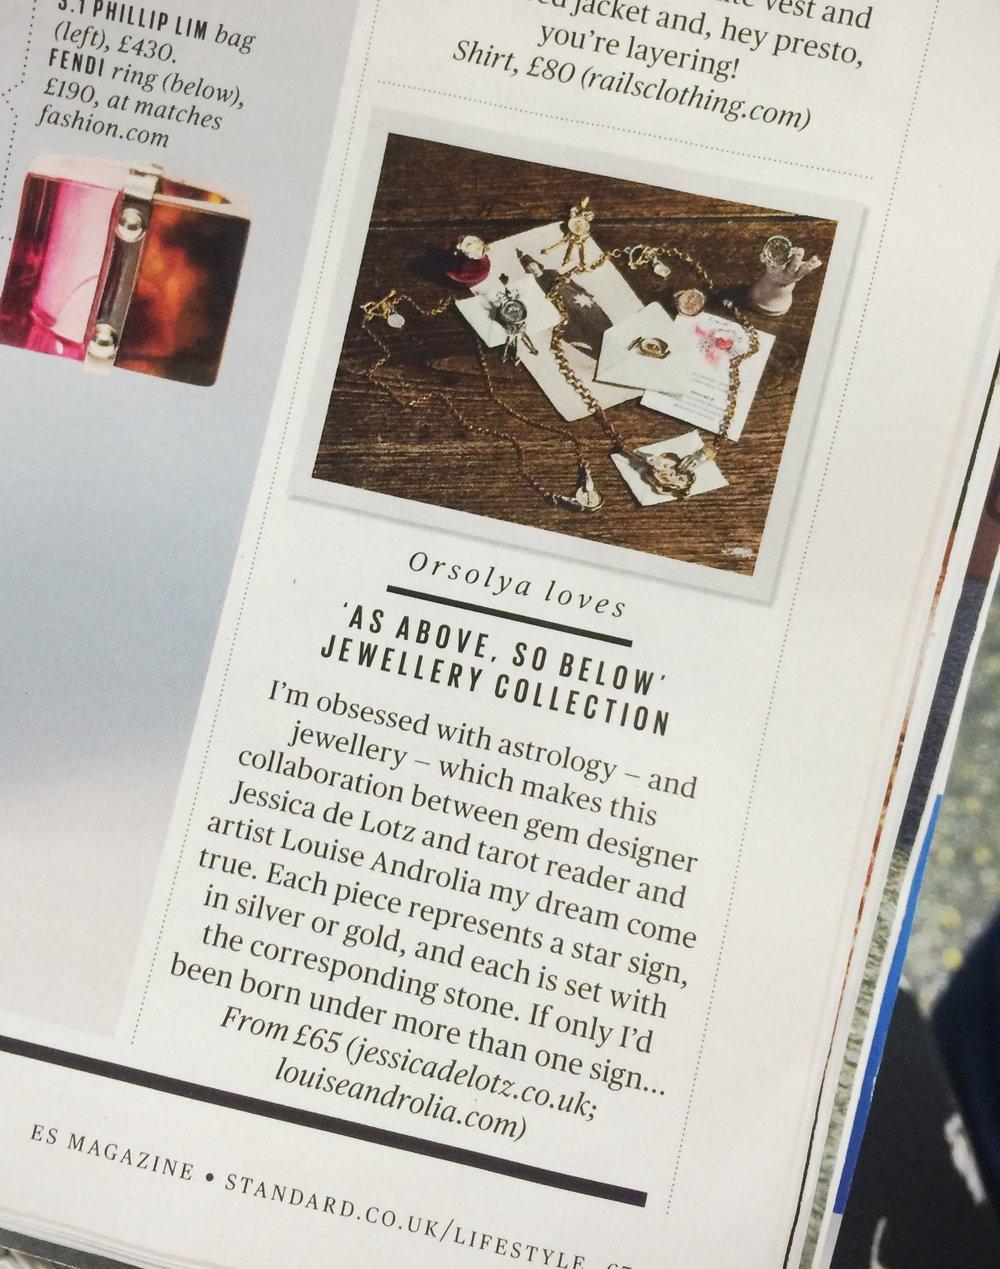 jdxla-esmagazine-oct2014.JPG